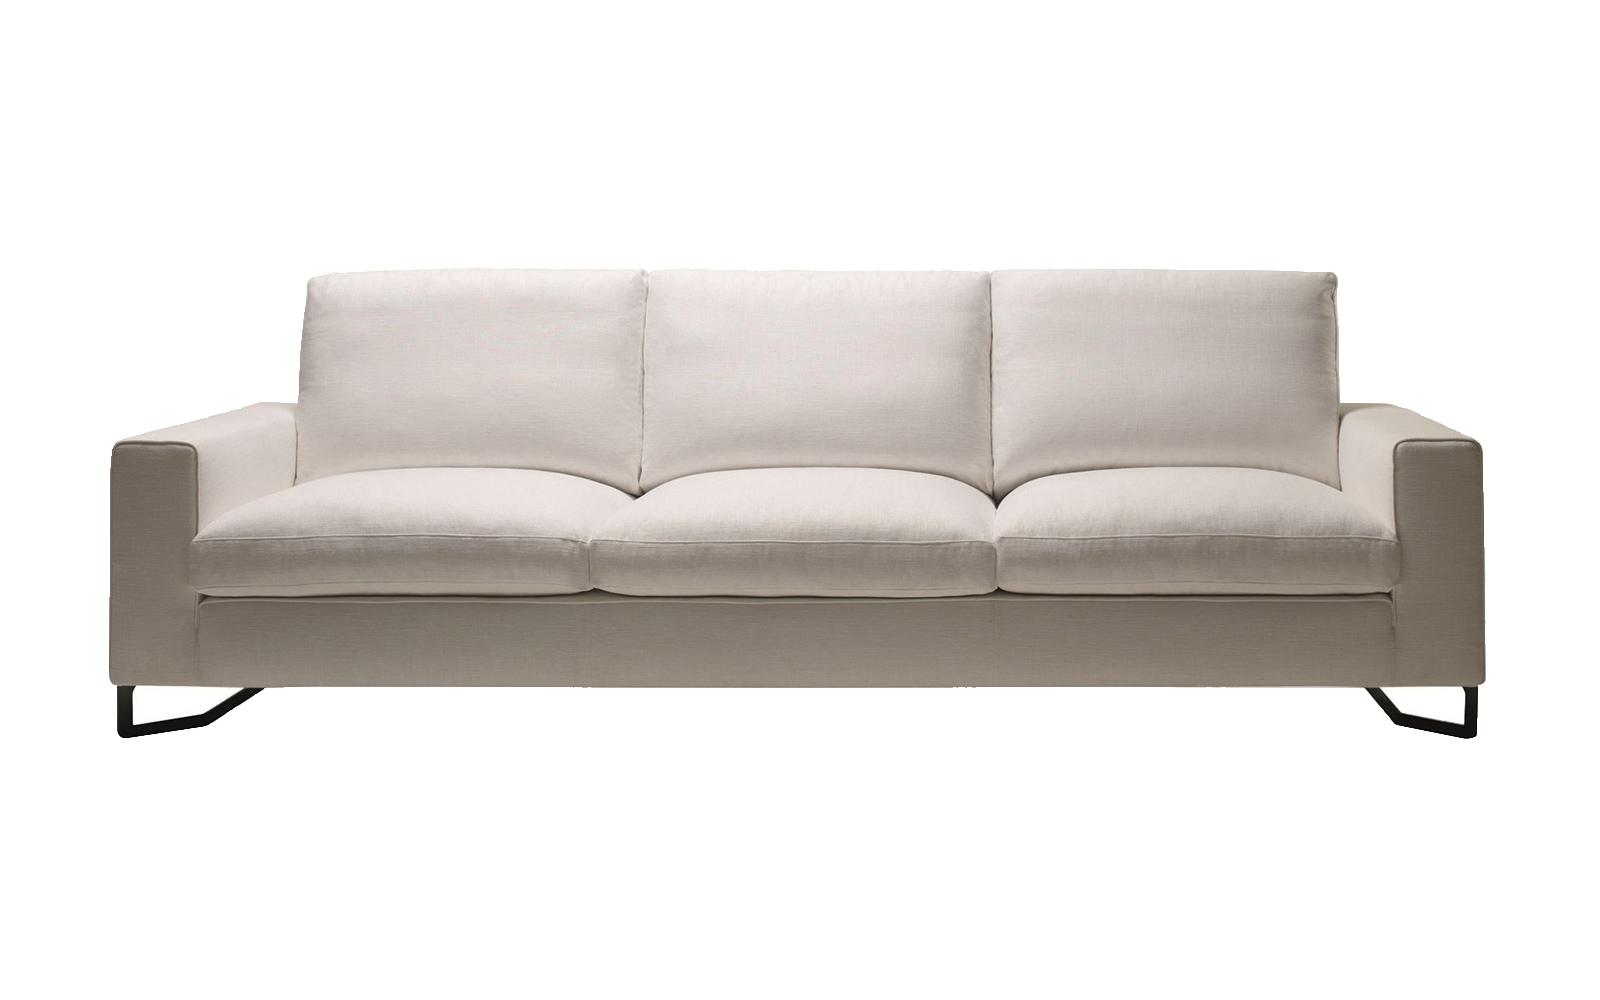 Sofá bika blanco